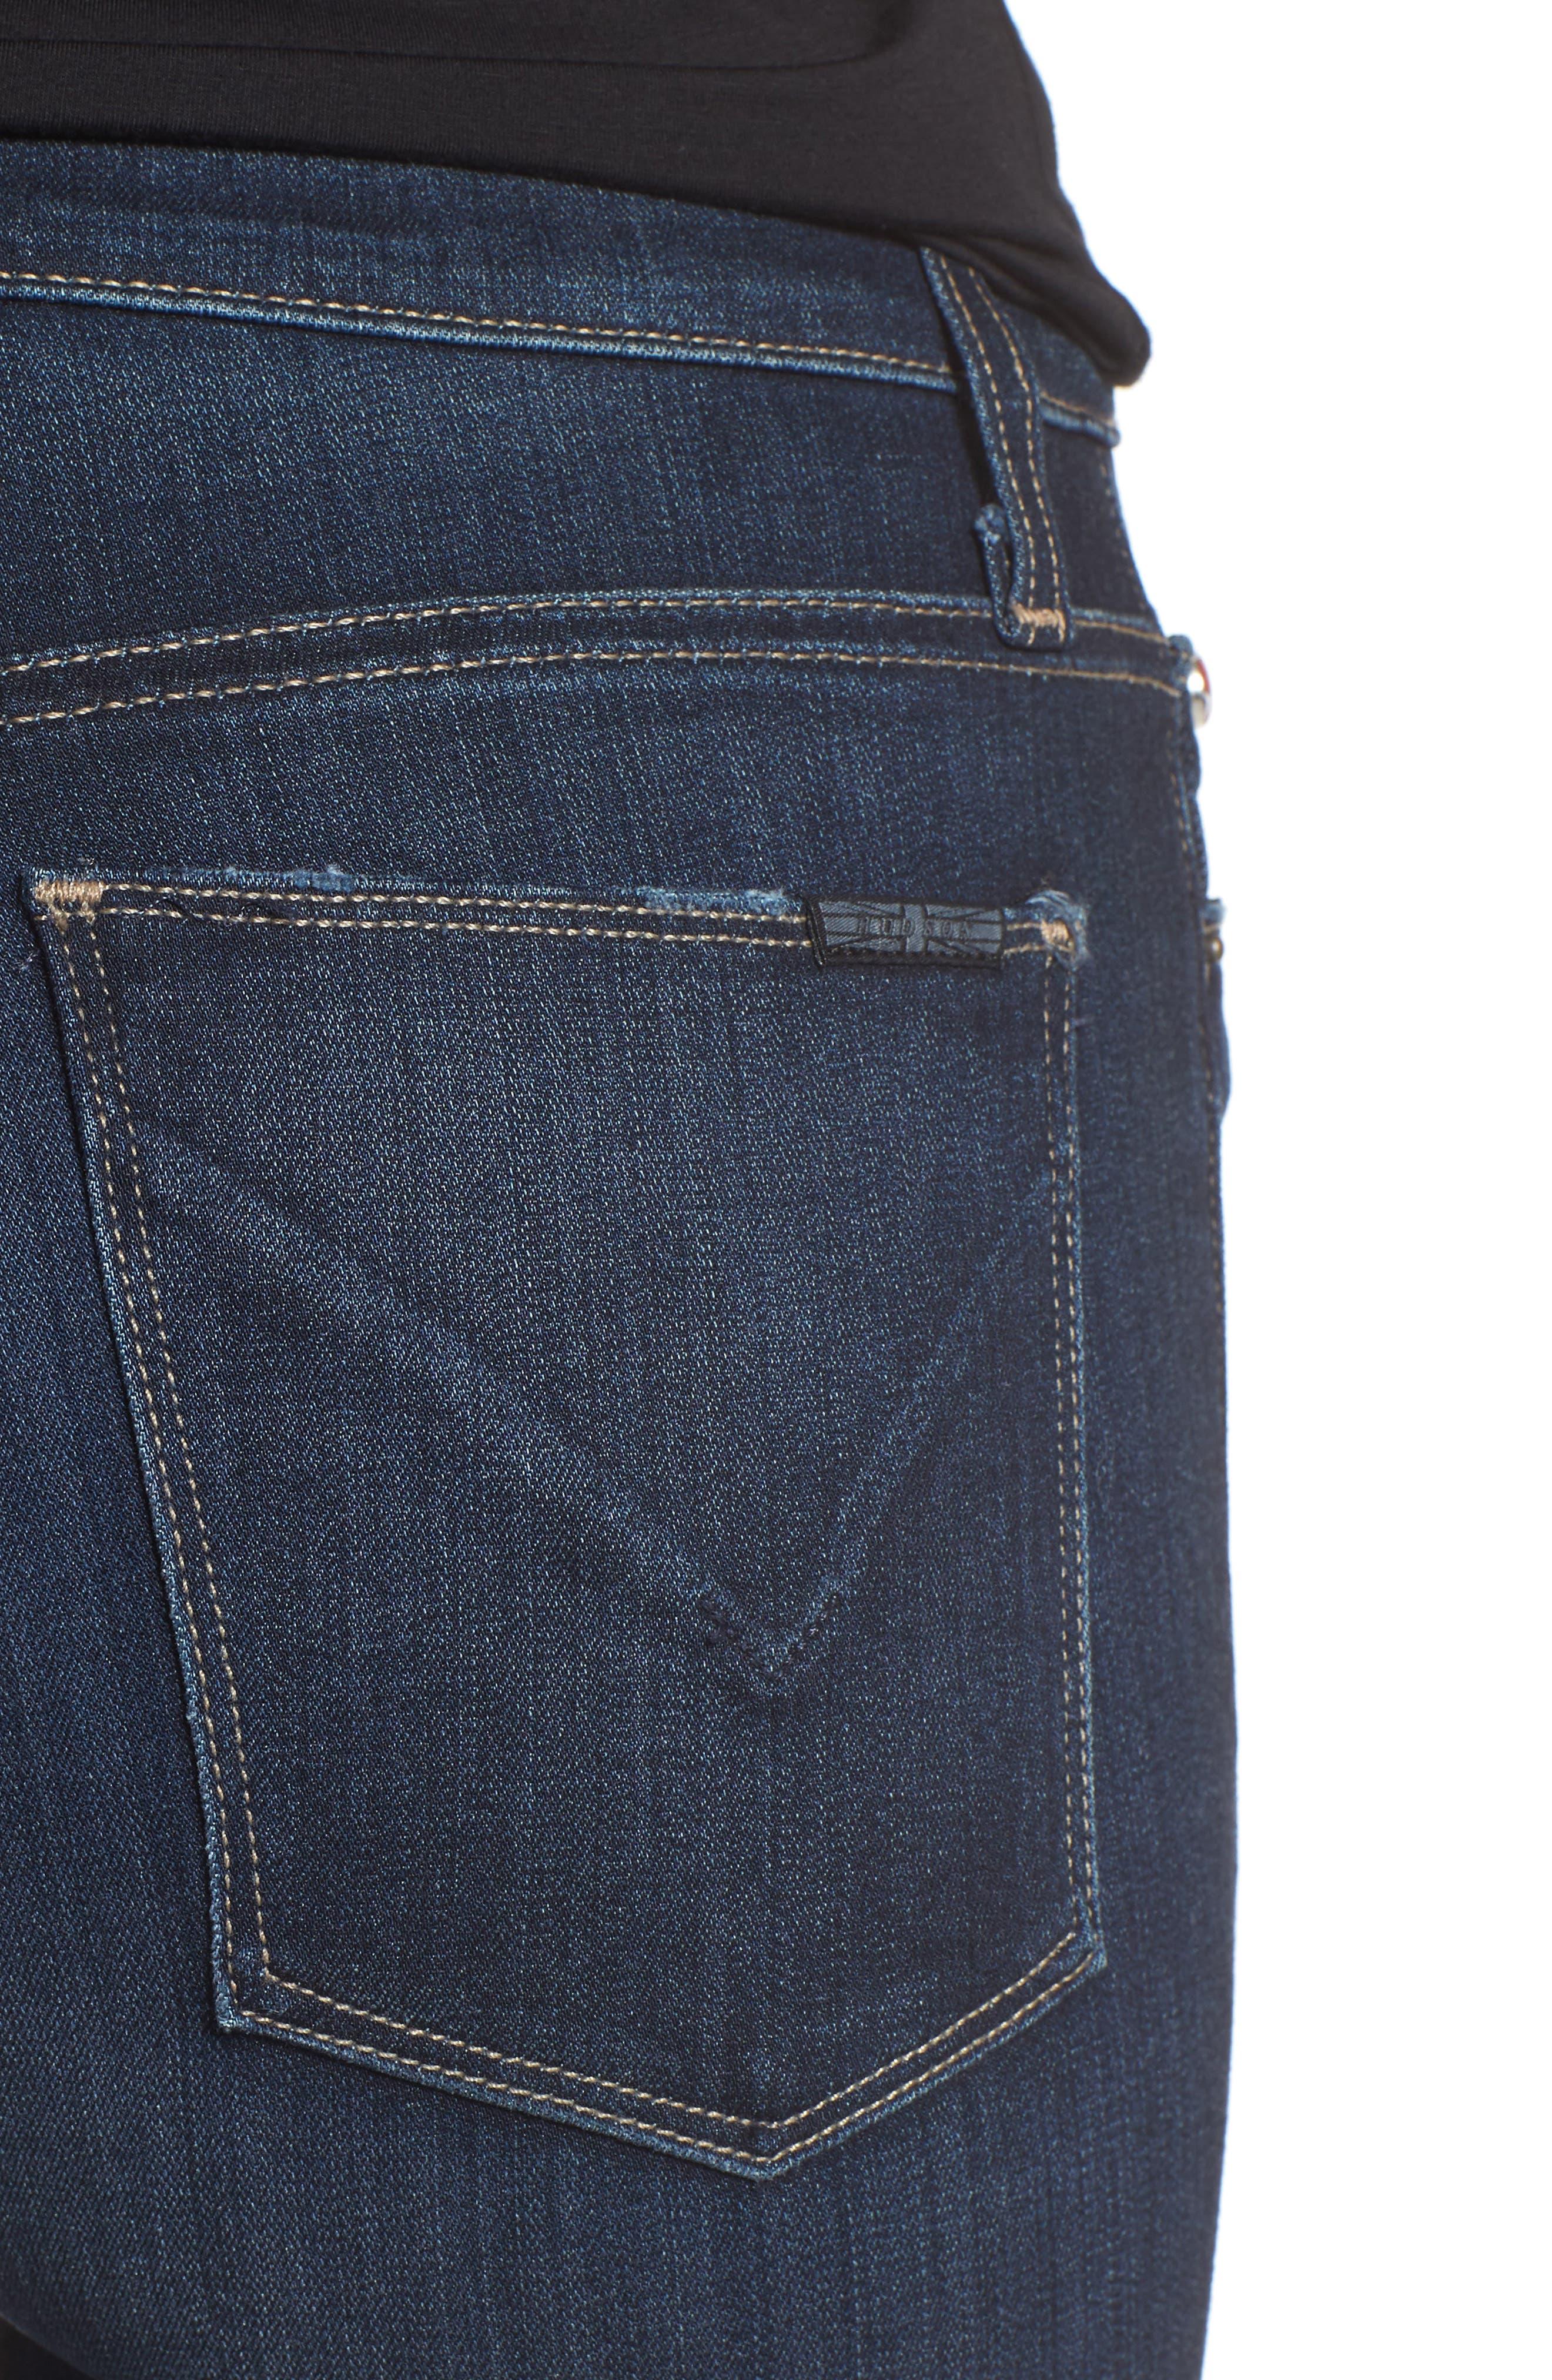 Barbara High Waist Super Skinny Jeans,                             Alternate thumbnail 8, color,